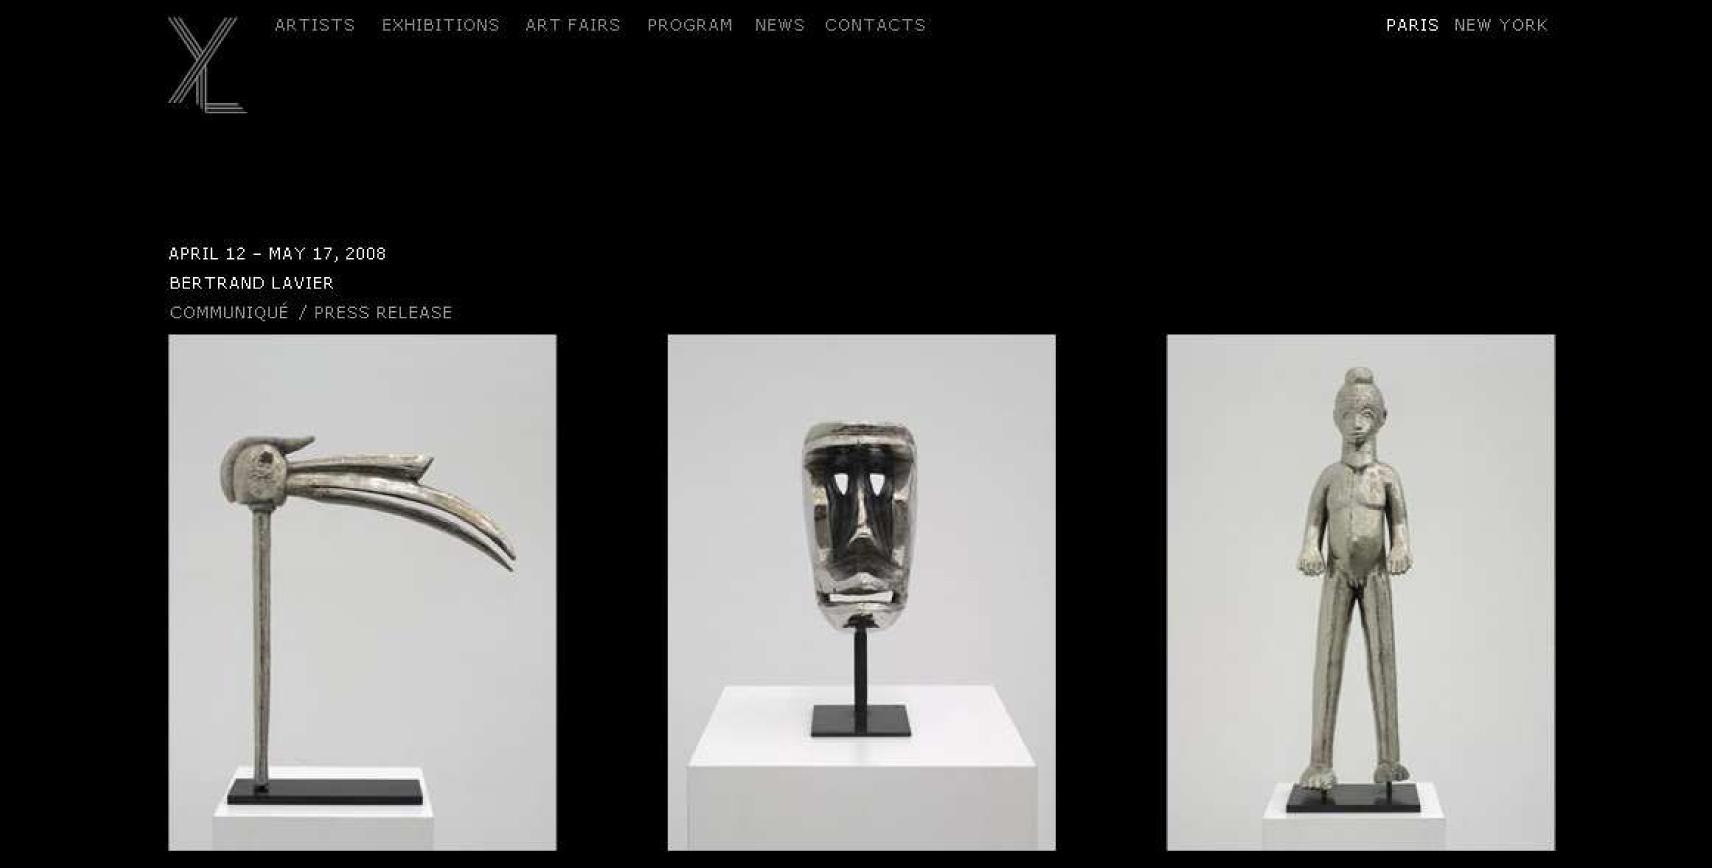 bertrand-lavier-web-galerie.jpg